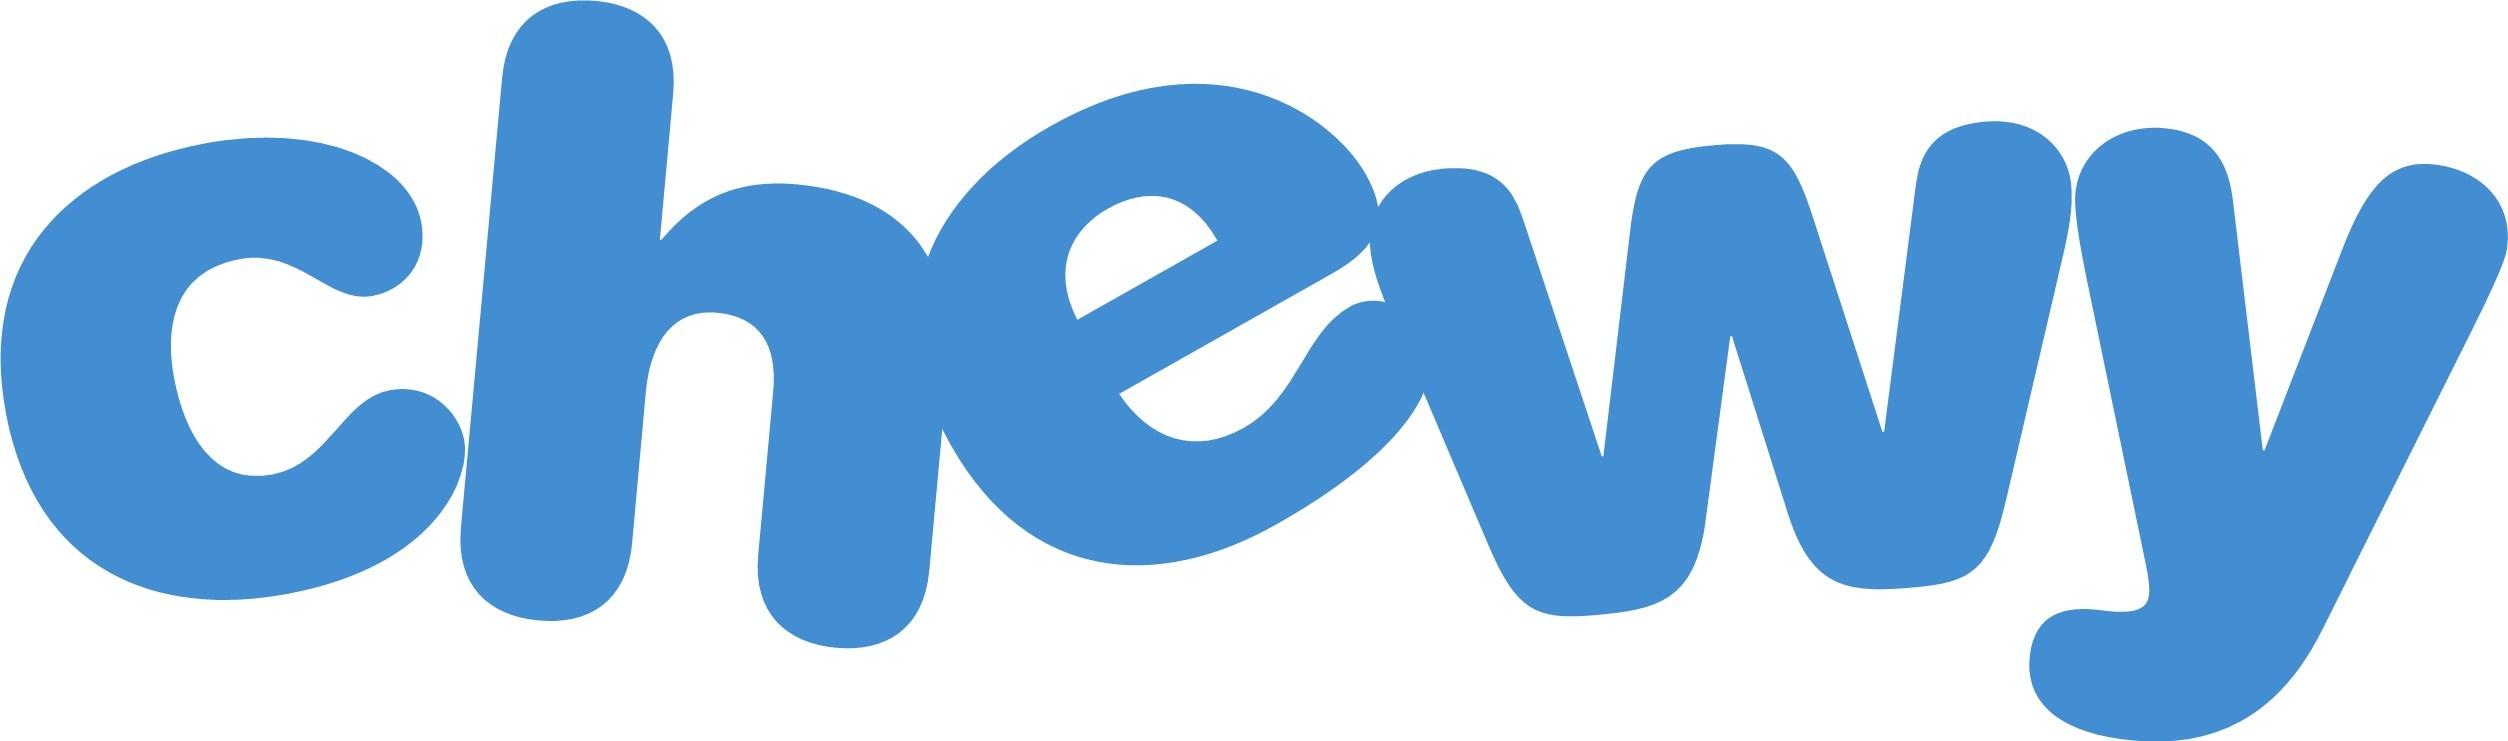 Chewy_Logo.jpg